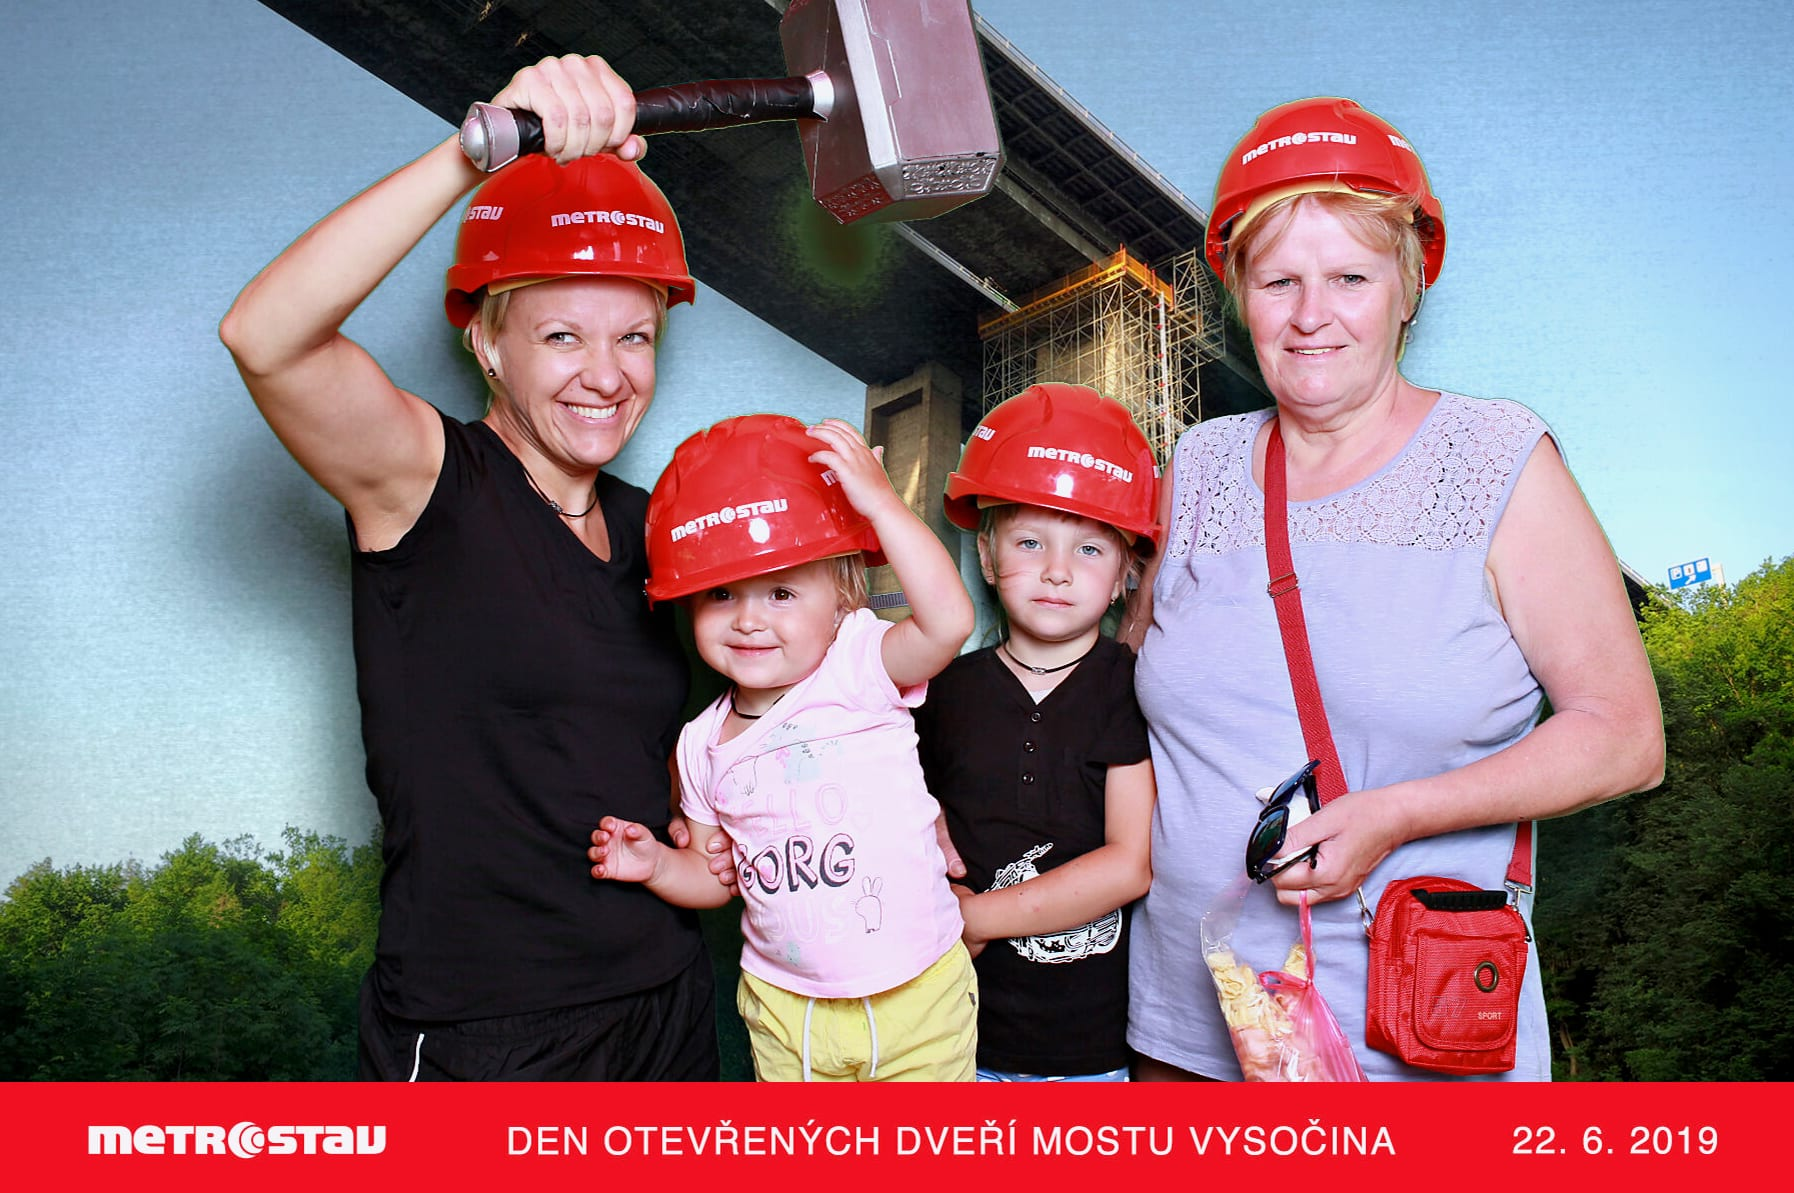 fotokoutek-brno-promo-akce-metrostav-22-6-2019-630421